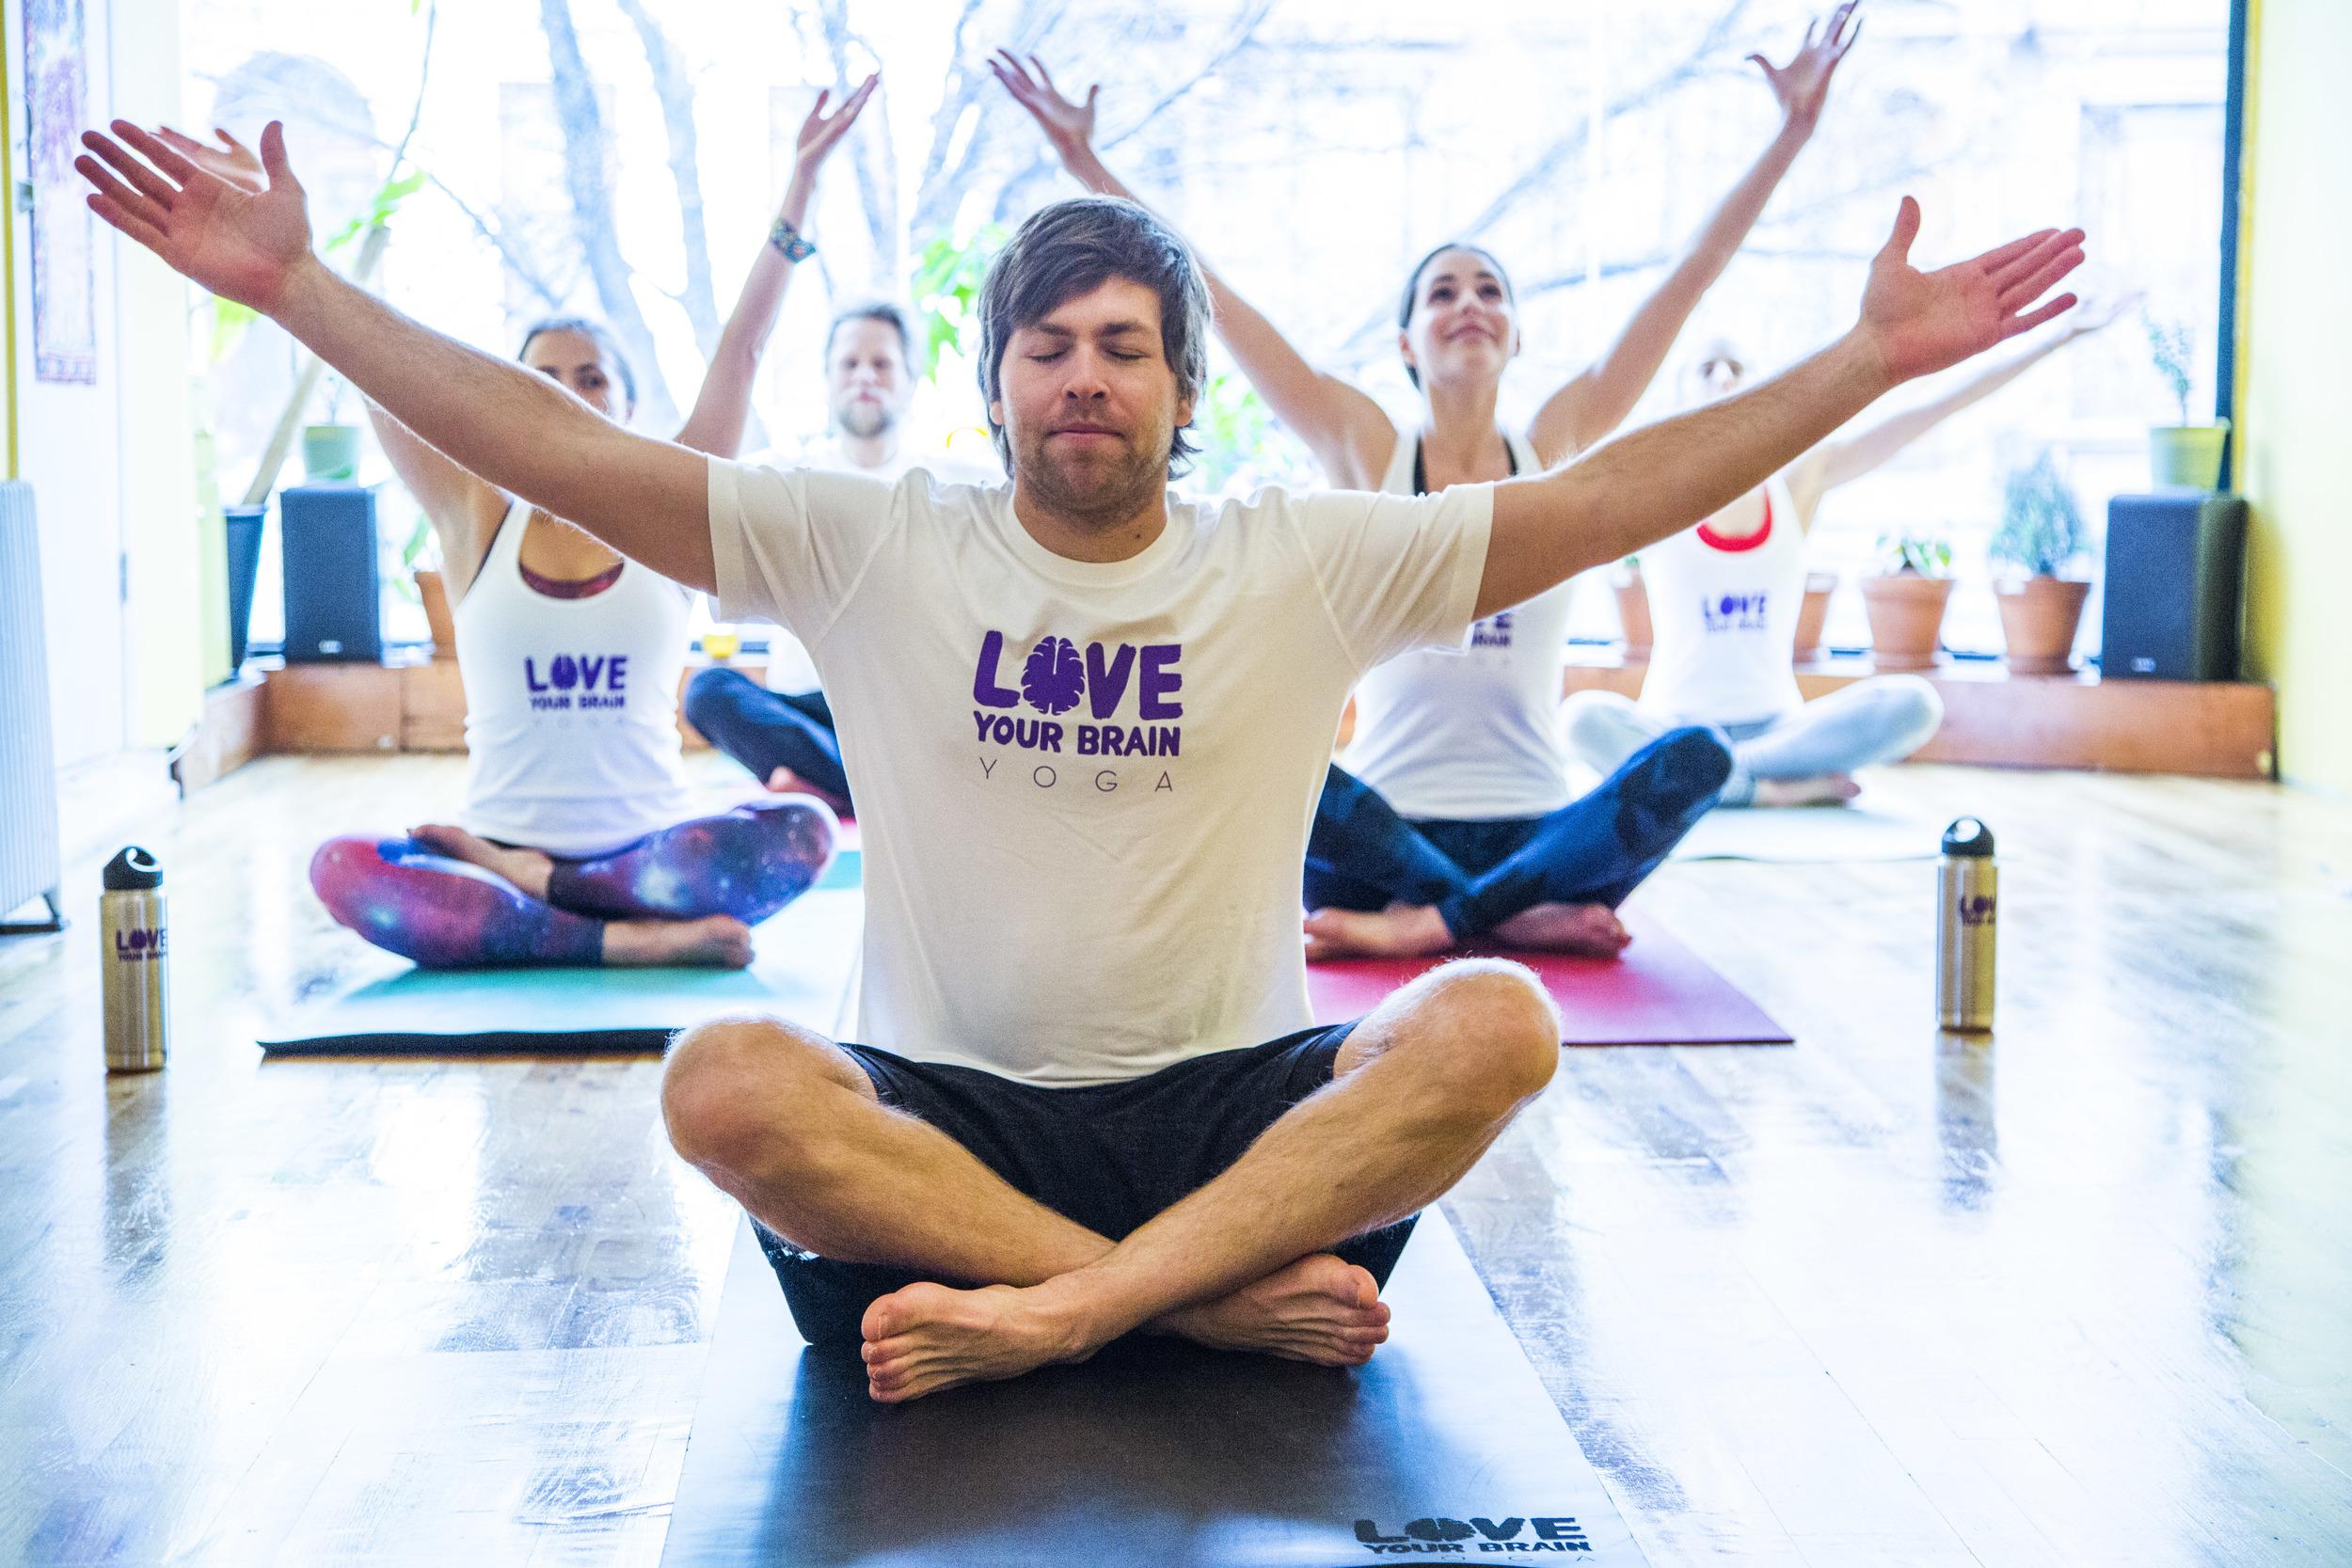 loveyoubrain yoga